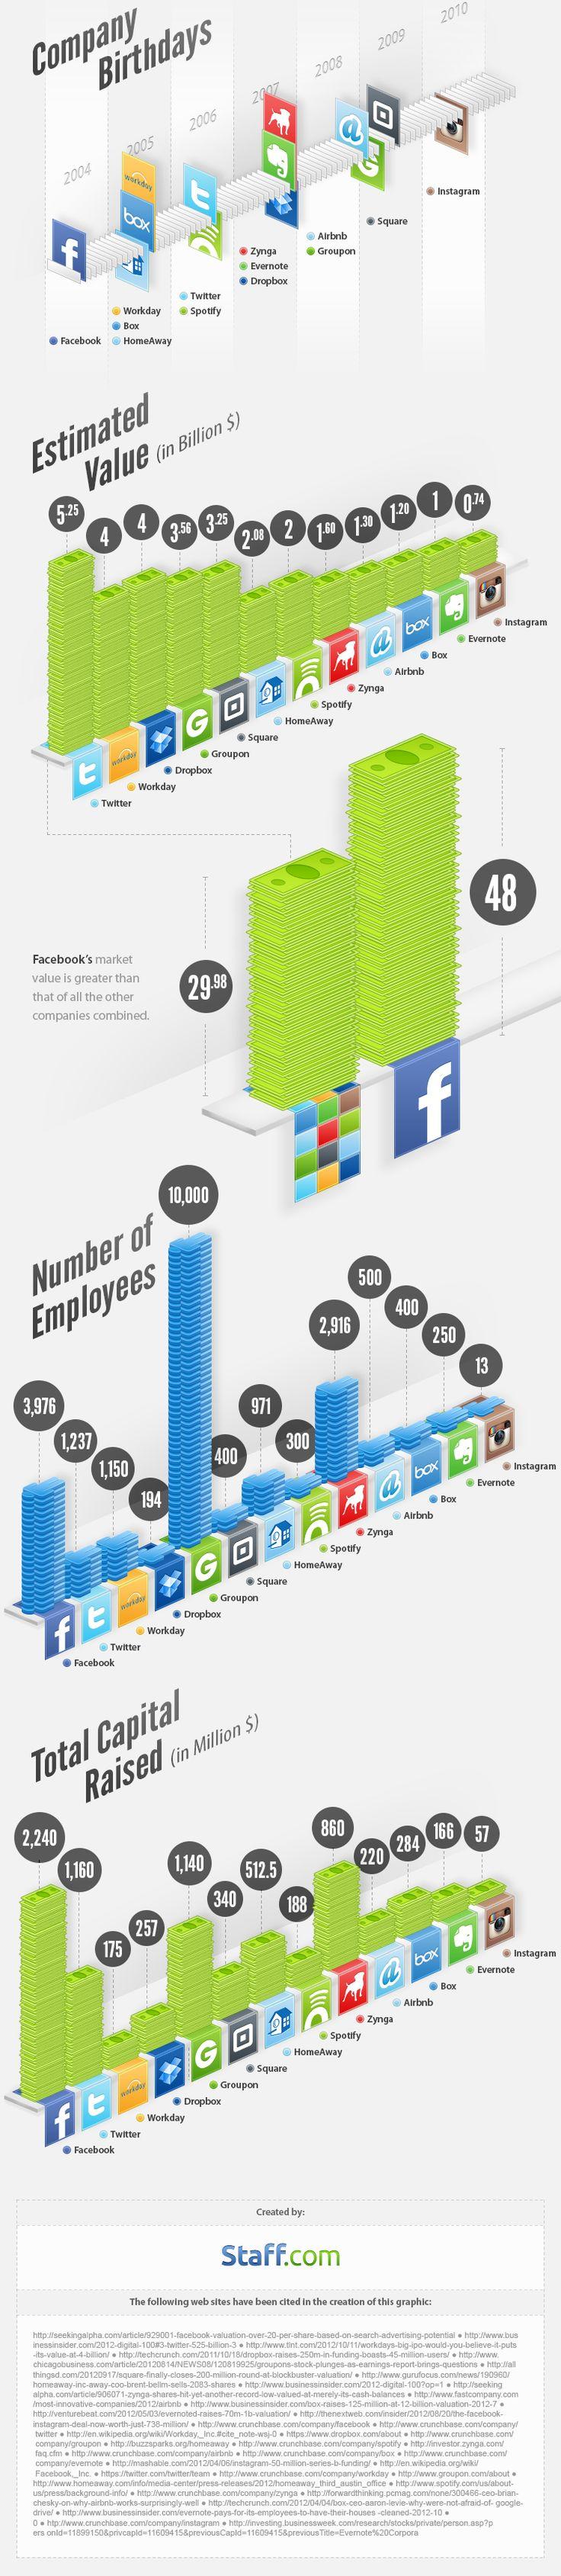 The billion dollar startups: Social Network,  Internet Site, Billion Dollar,  Website, Web Site, Social Media, Billiondollar Startups, Socialmedia, Startups Infographic